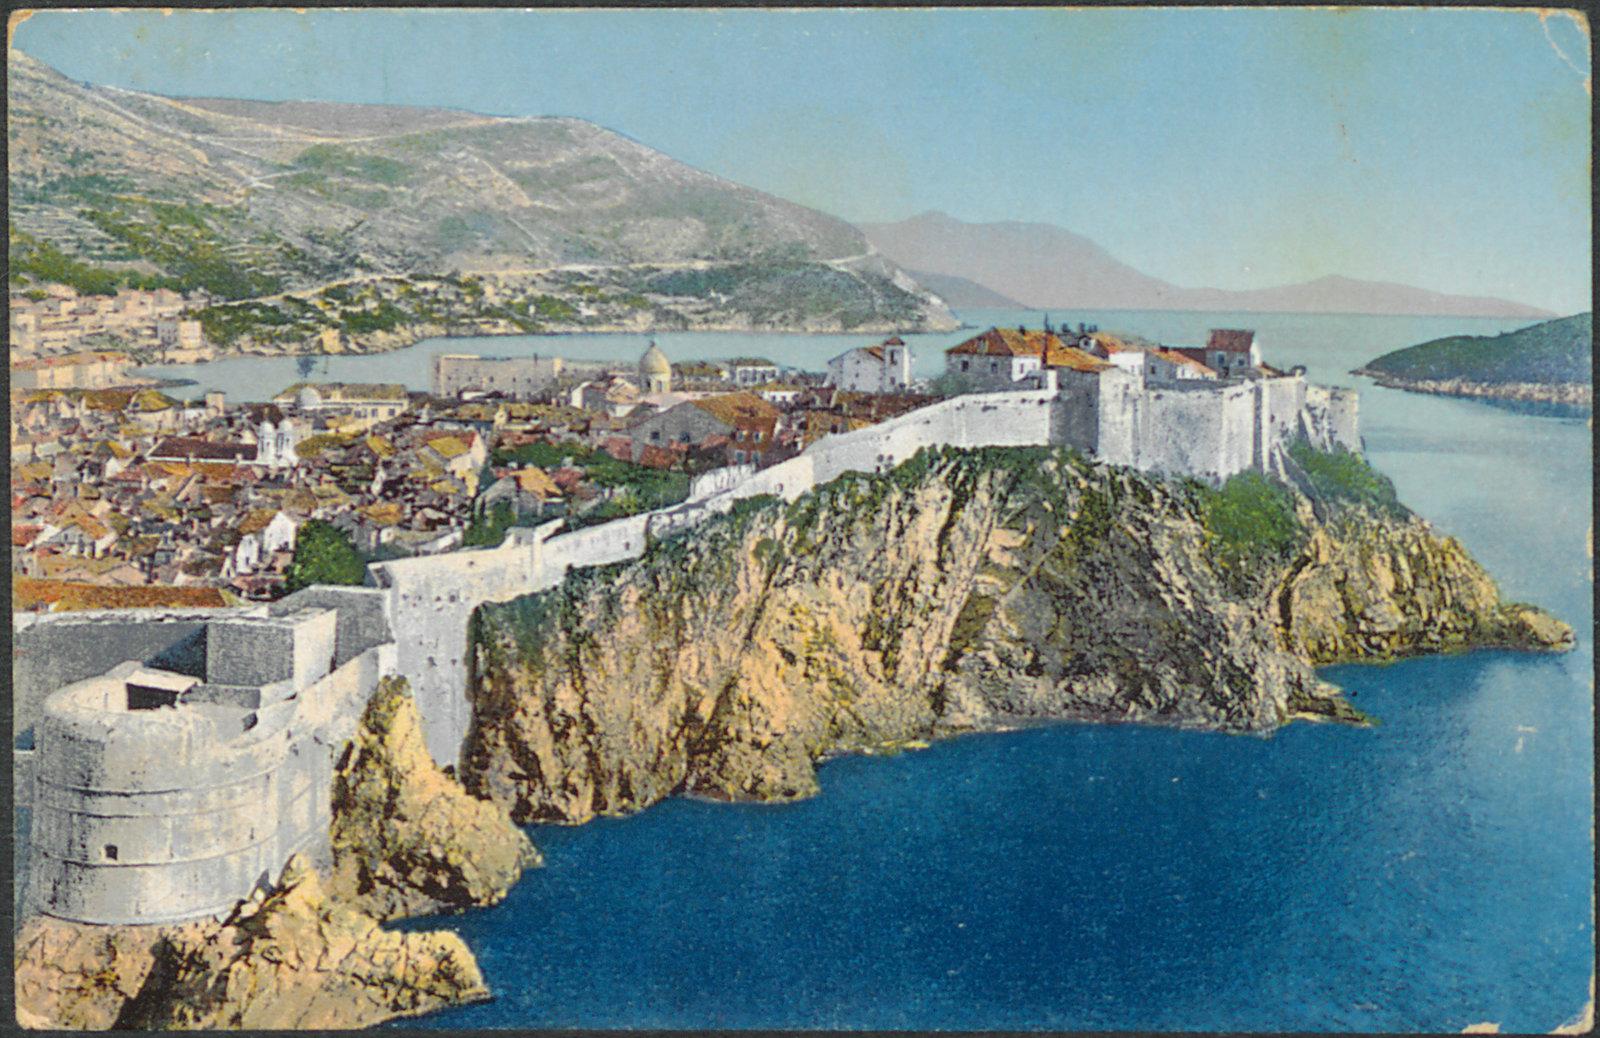 Dubrovnik [Ragusa], Tošović, National and University Library in Zagreb, Public Domain Mark